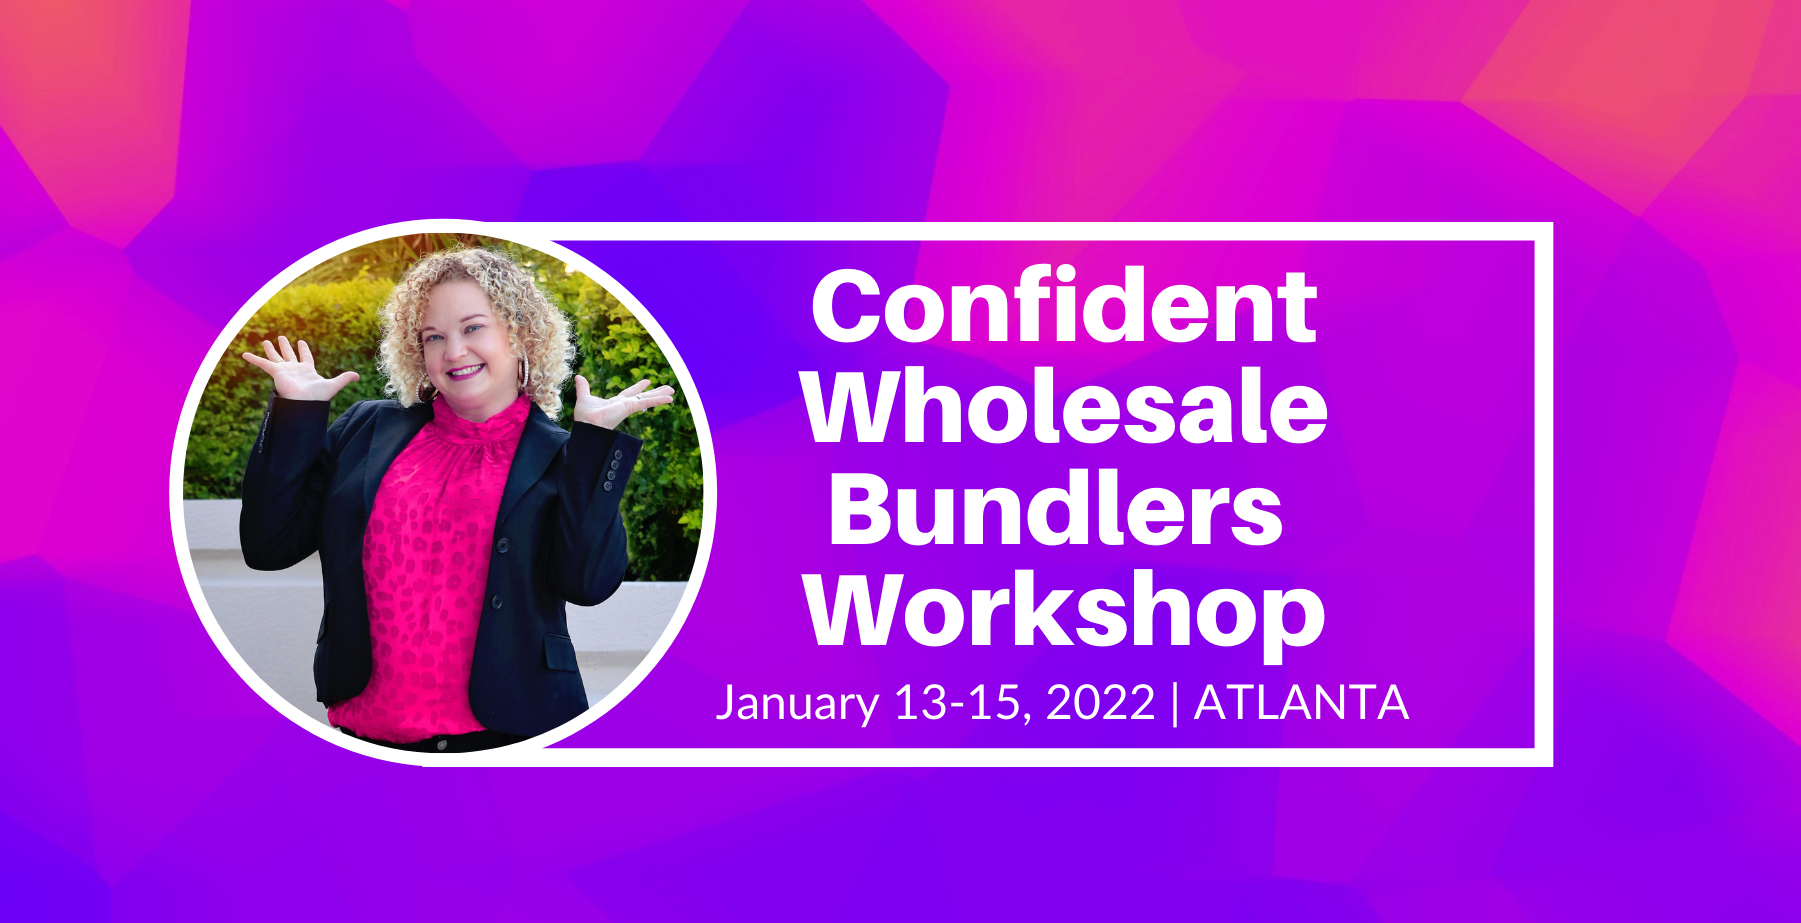 Confident Wholesale Bundler's Workshop